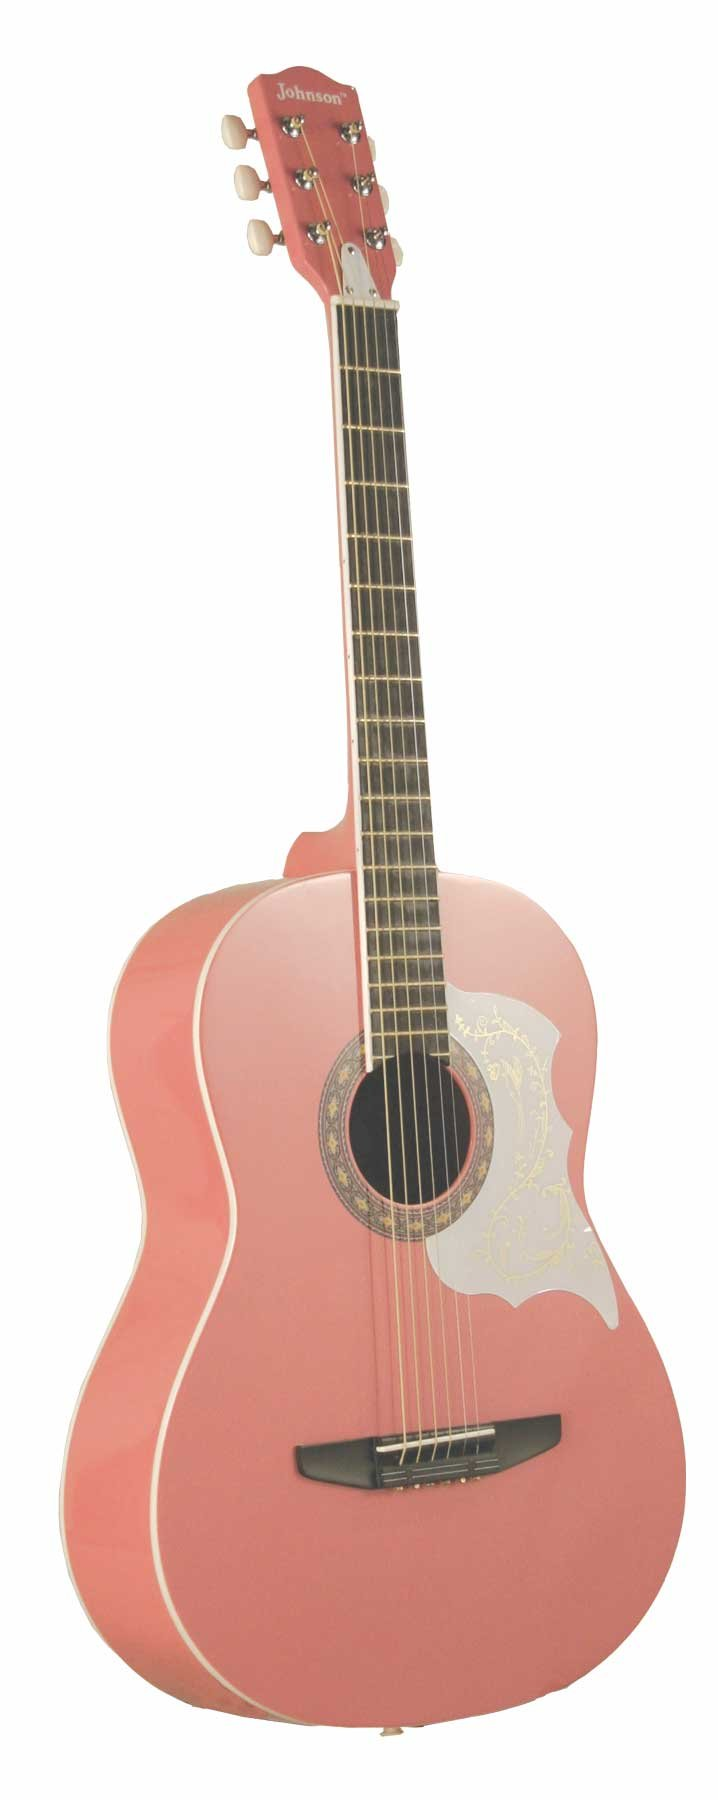 Johnson JG-100-PK Student Acoustic Guitar, Pink